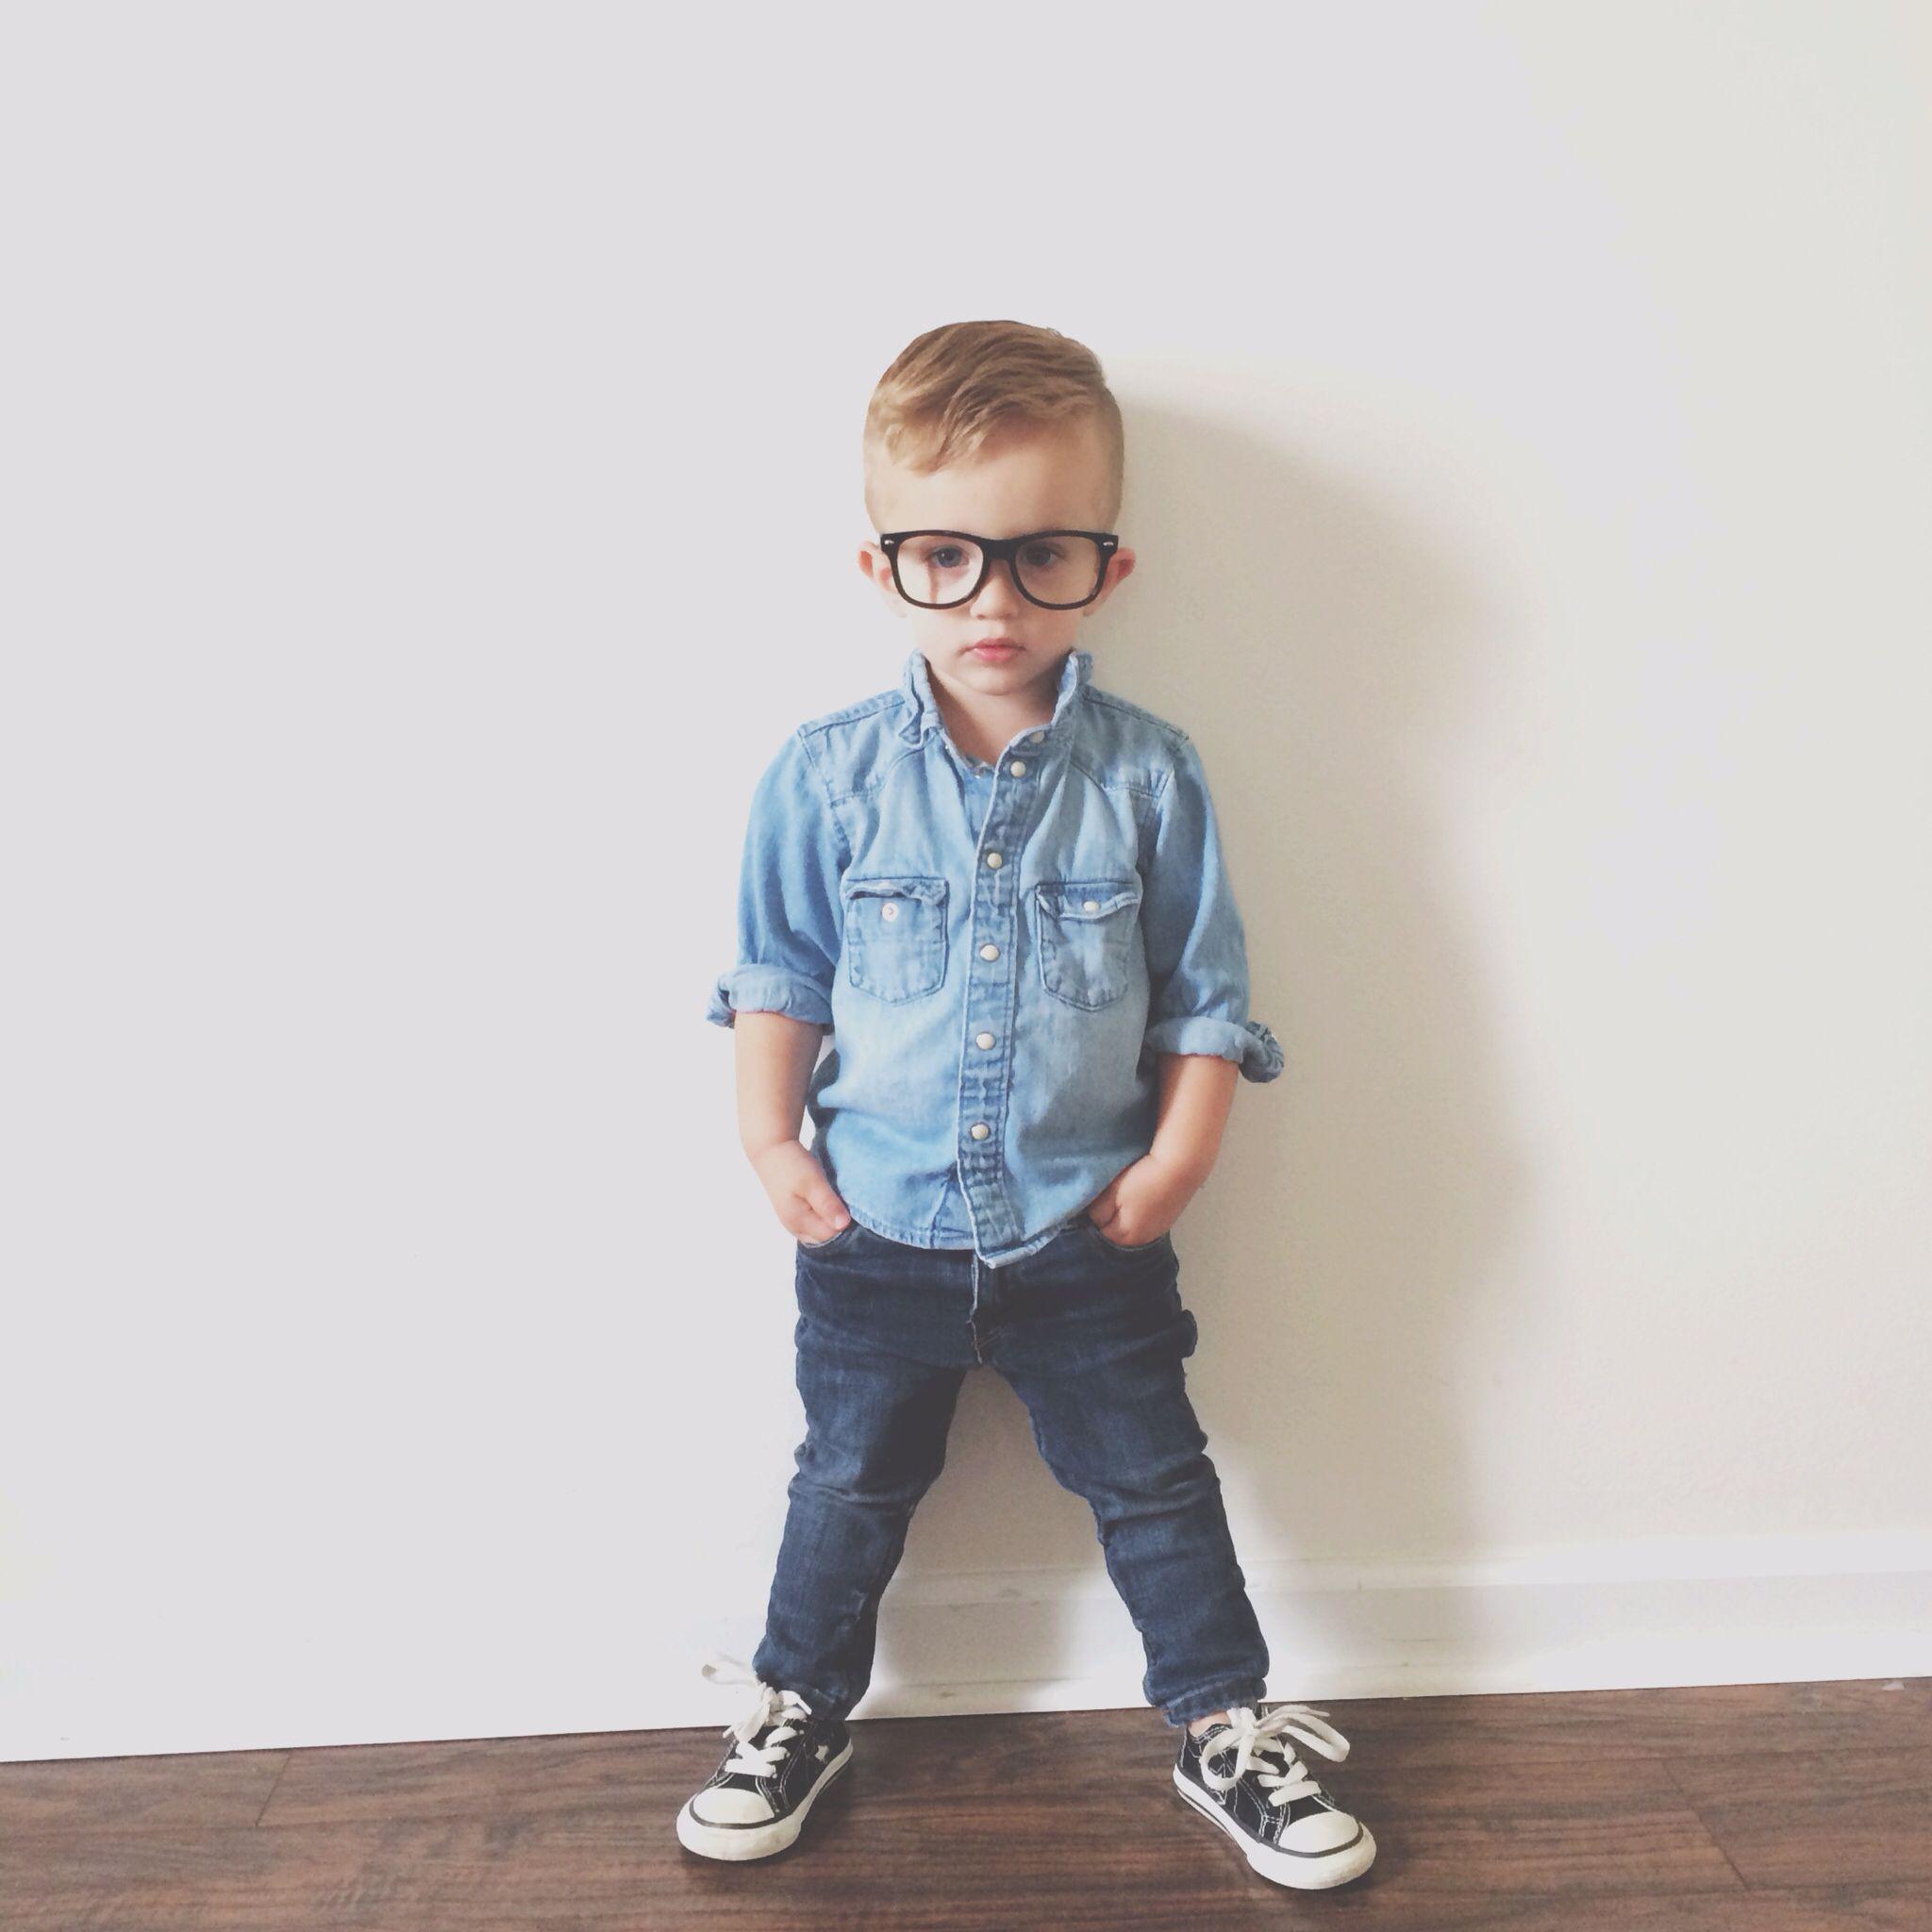 118a3092c25d Baby boy fashion via sarahknuth on Instagram. Menino Estiloso